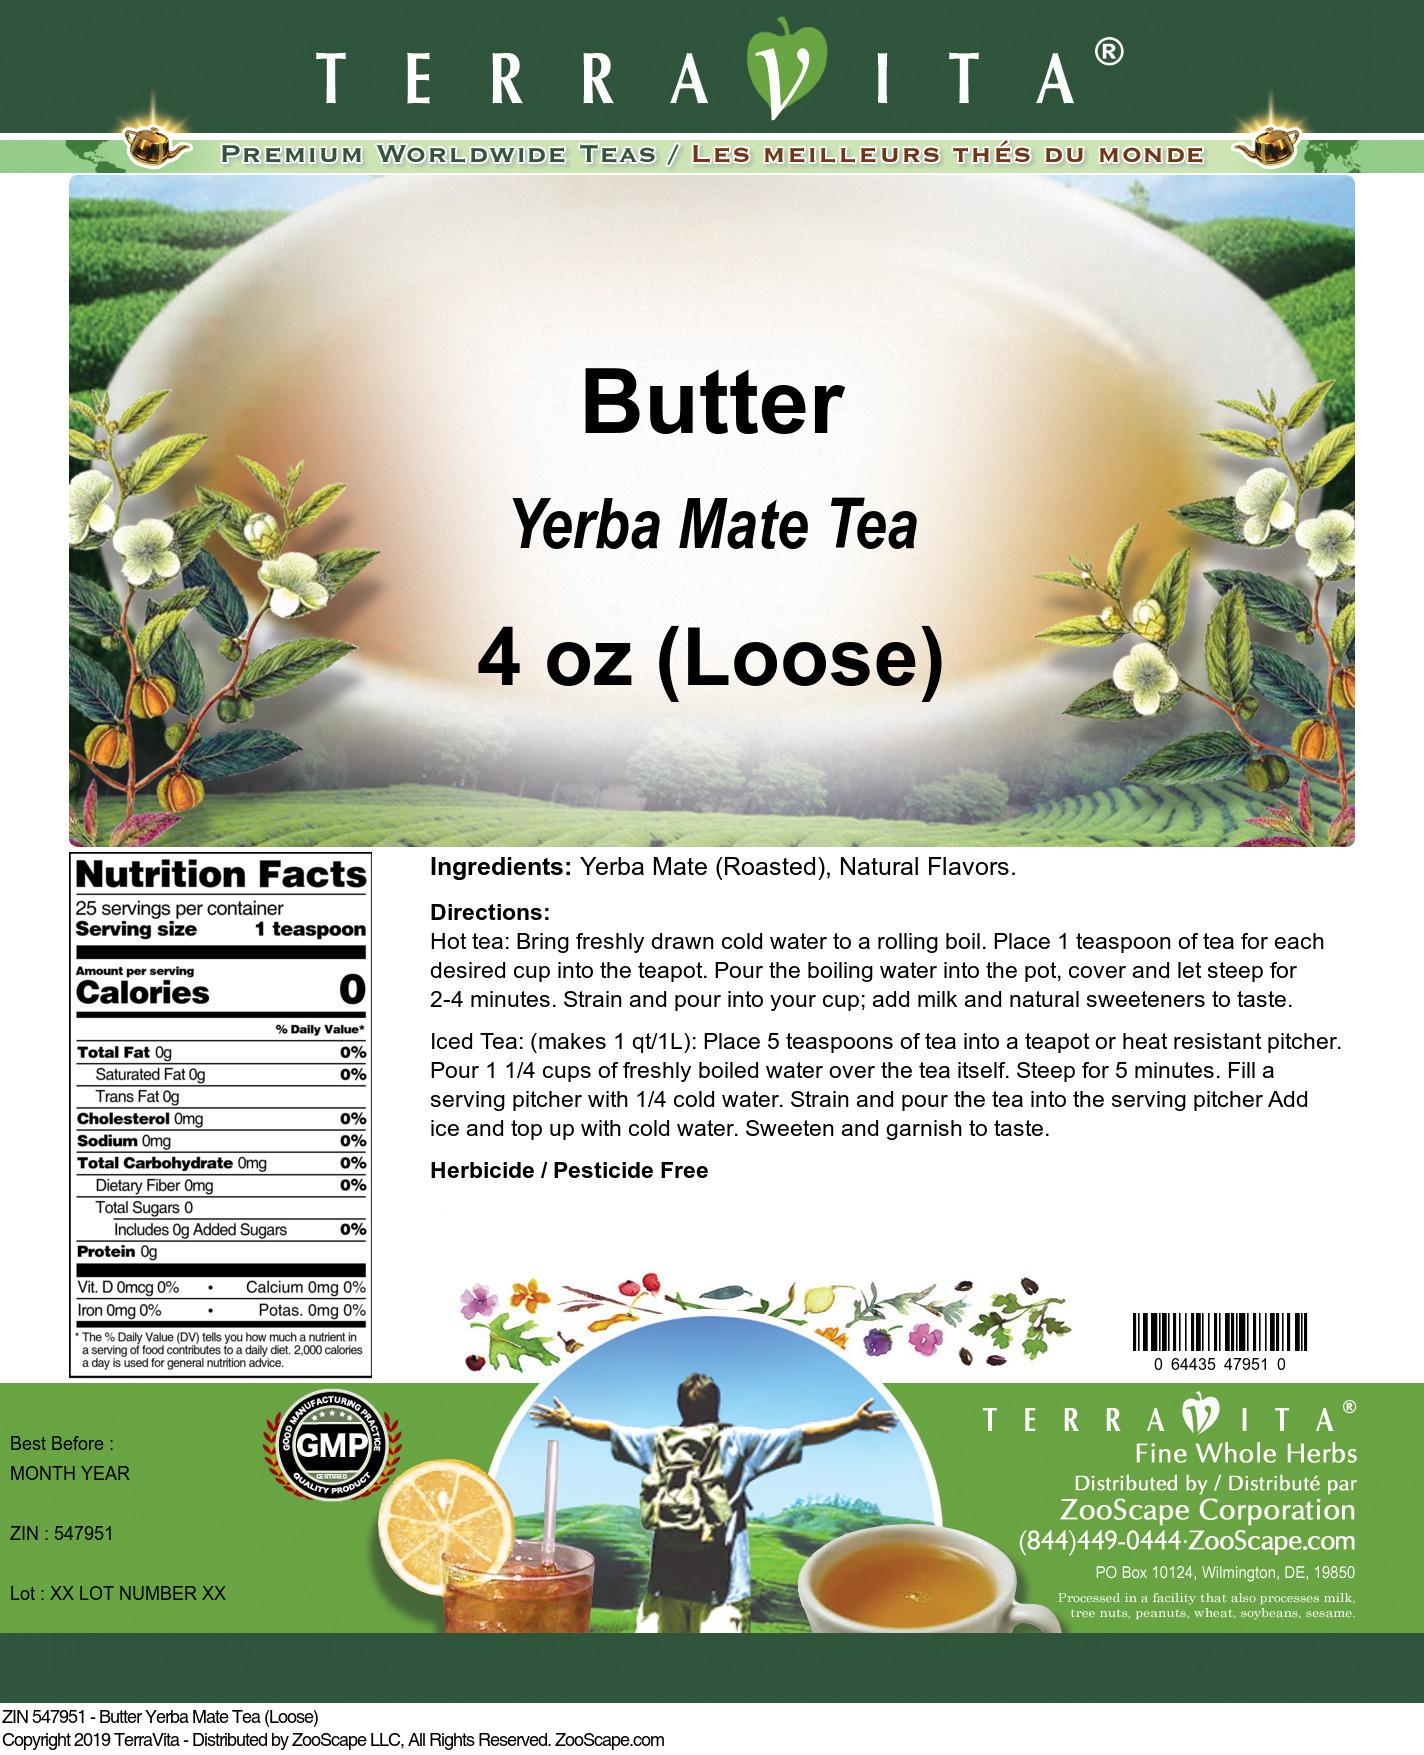 Butter Yerba Mate Tea (Loose)